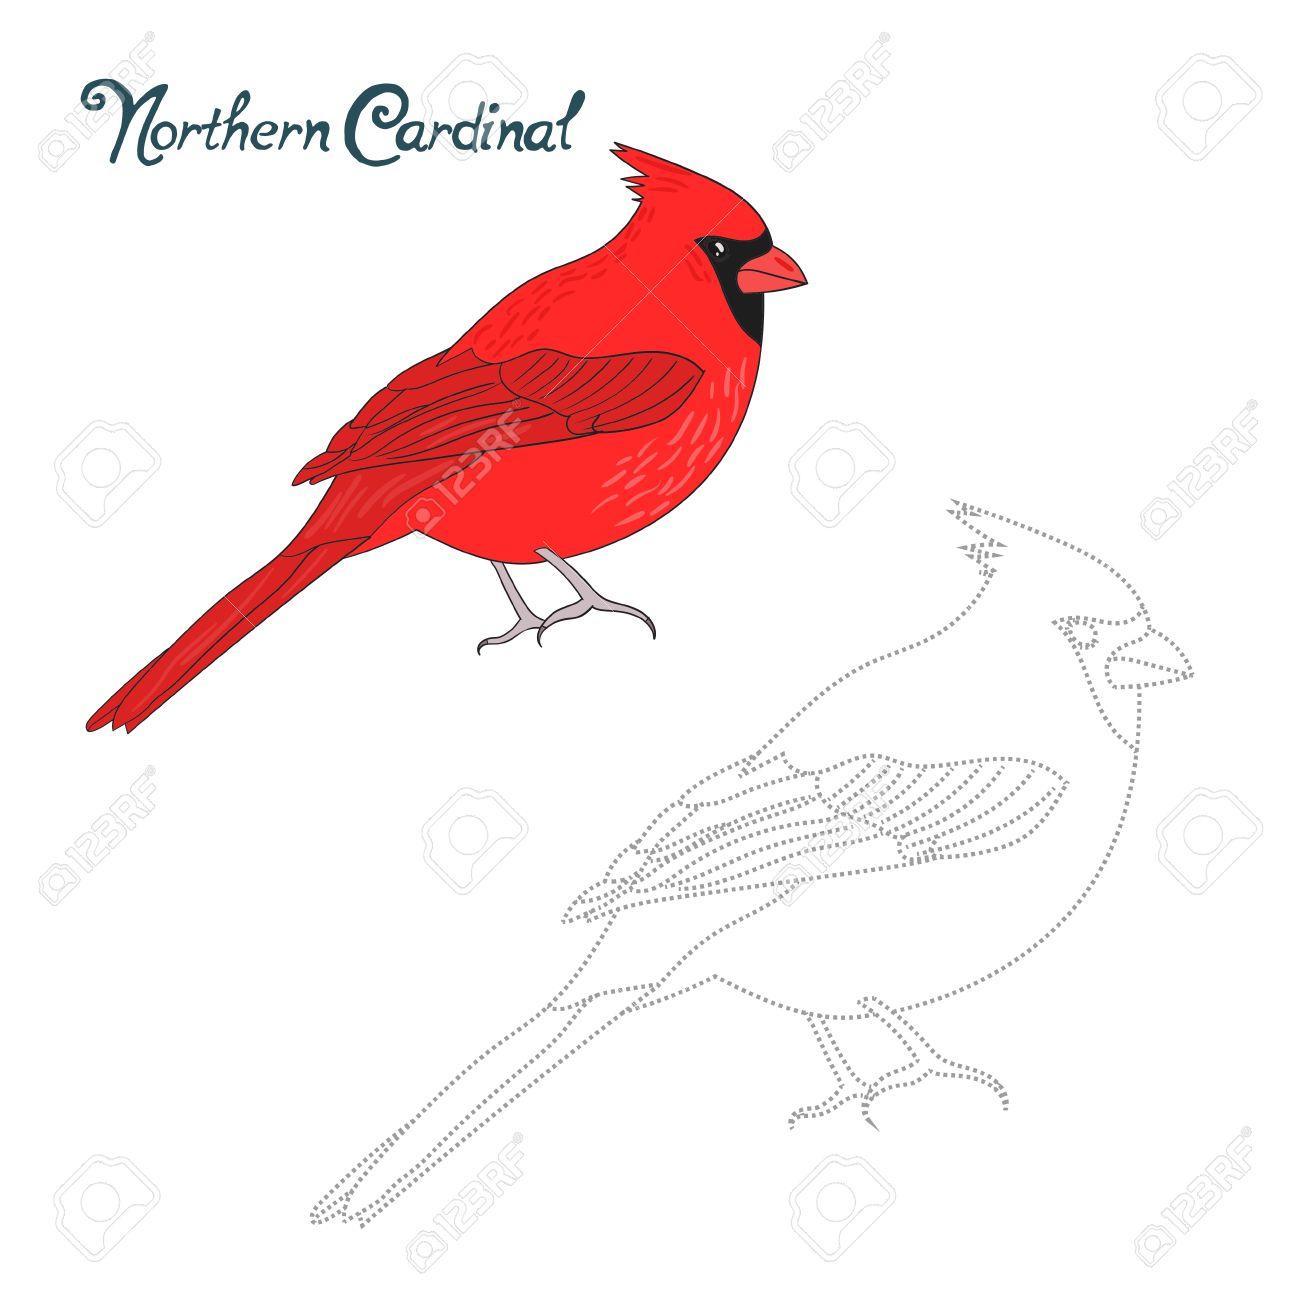 How to Draw a Cardinal, Step by Step, Birds, Animals, FREE ...  |Cardinal Bird Drawings